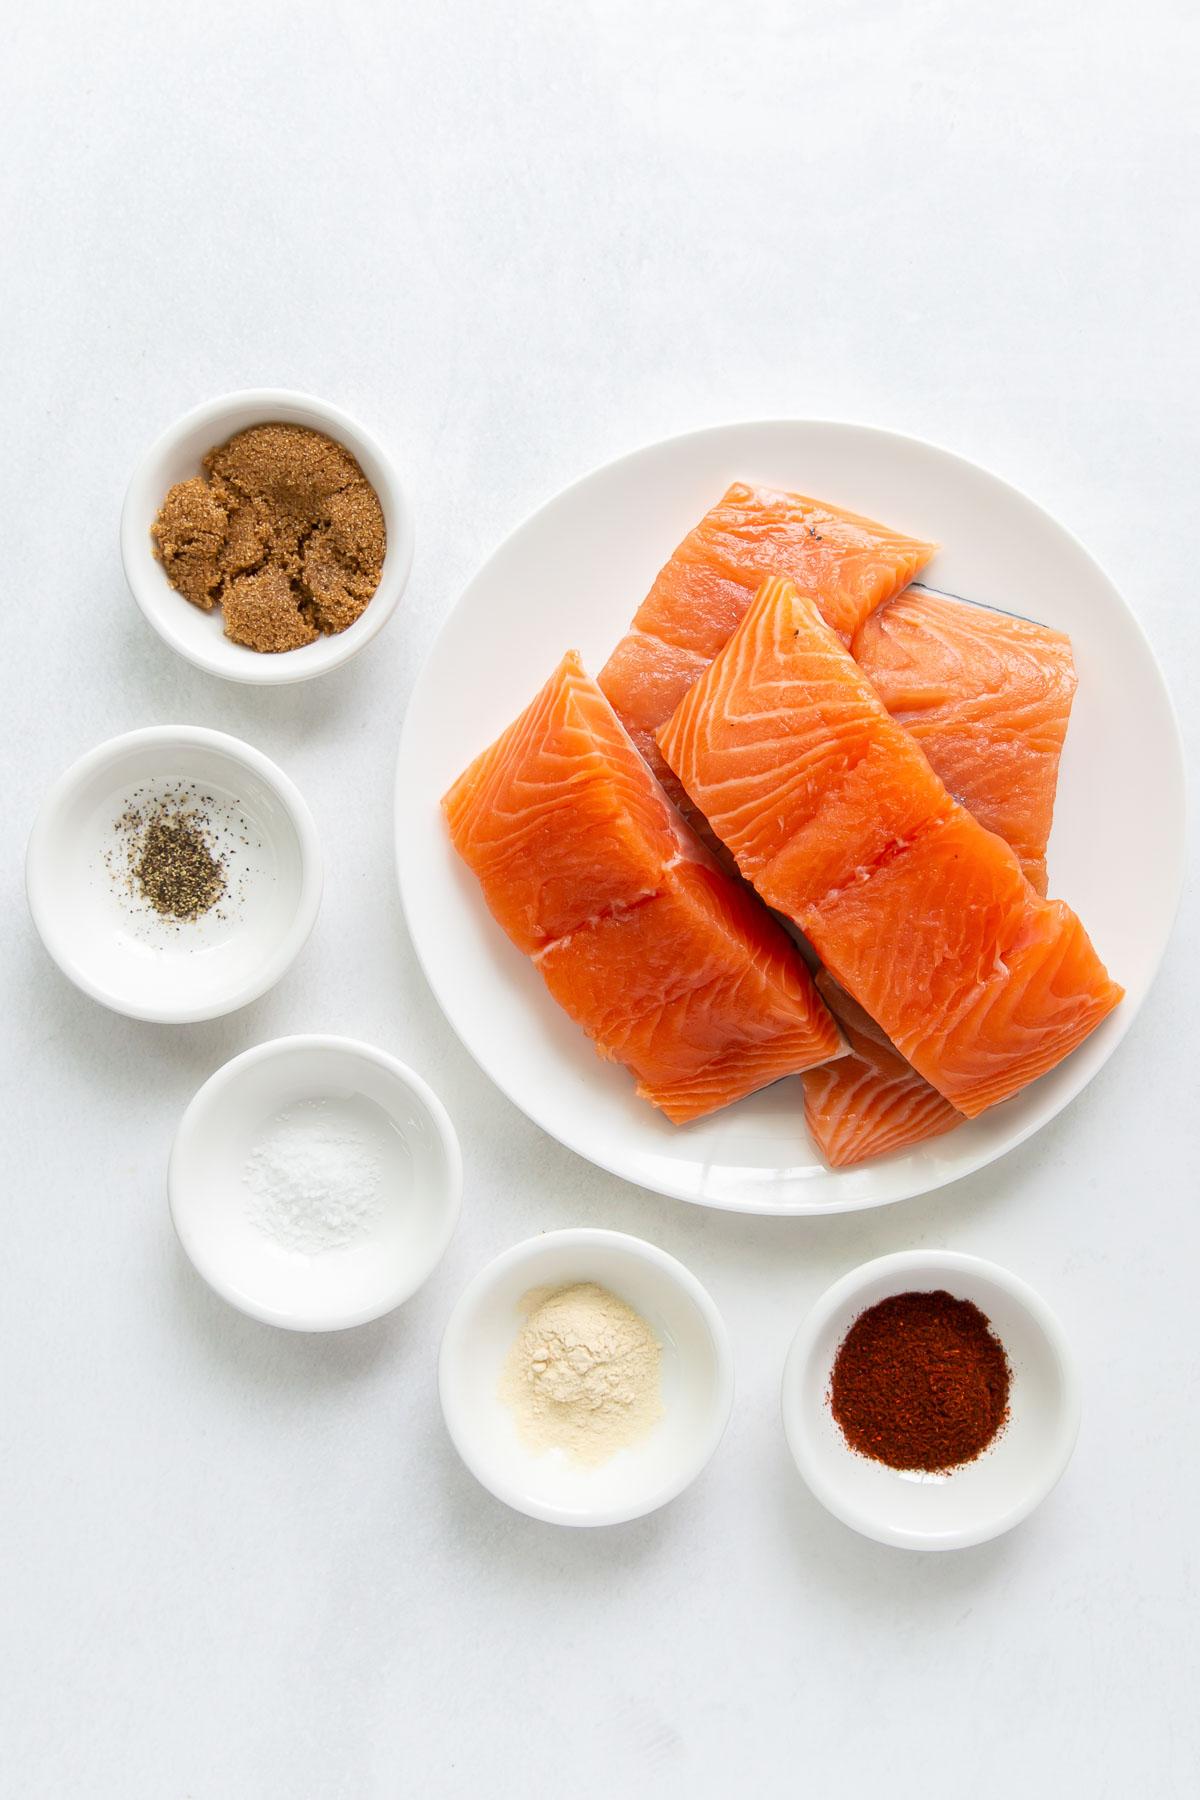 ingredients for air fryer salmon recipe